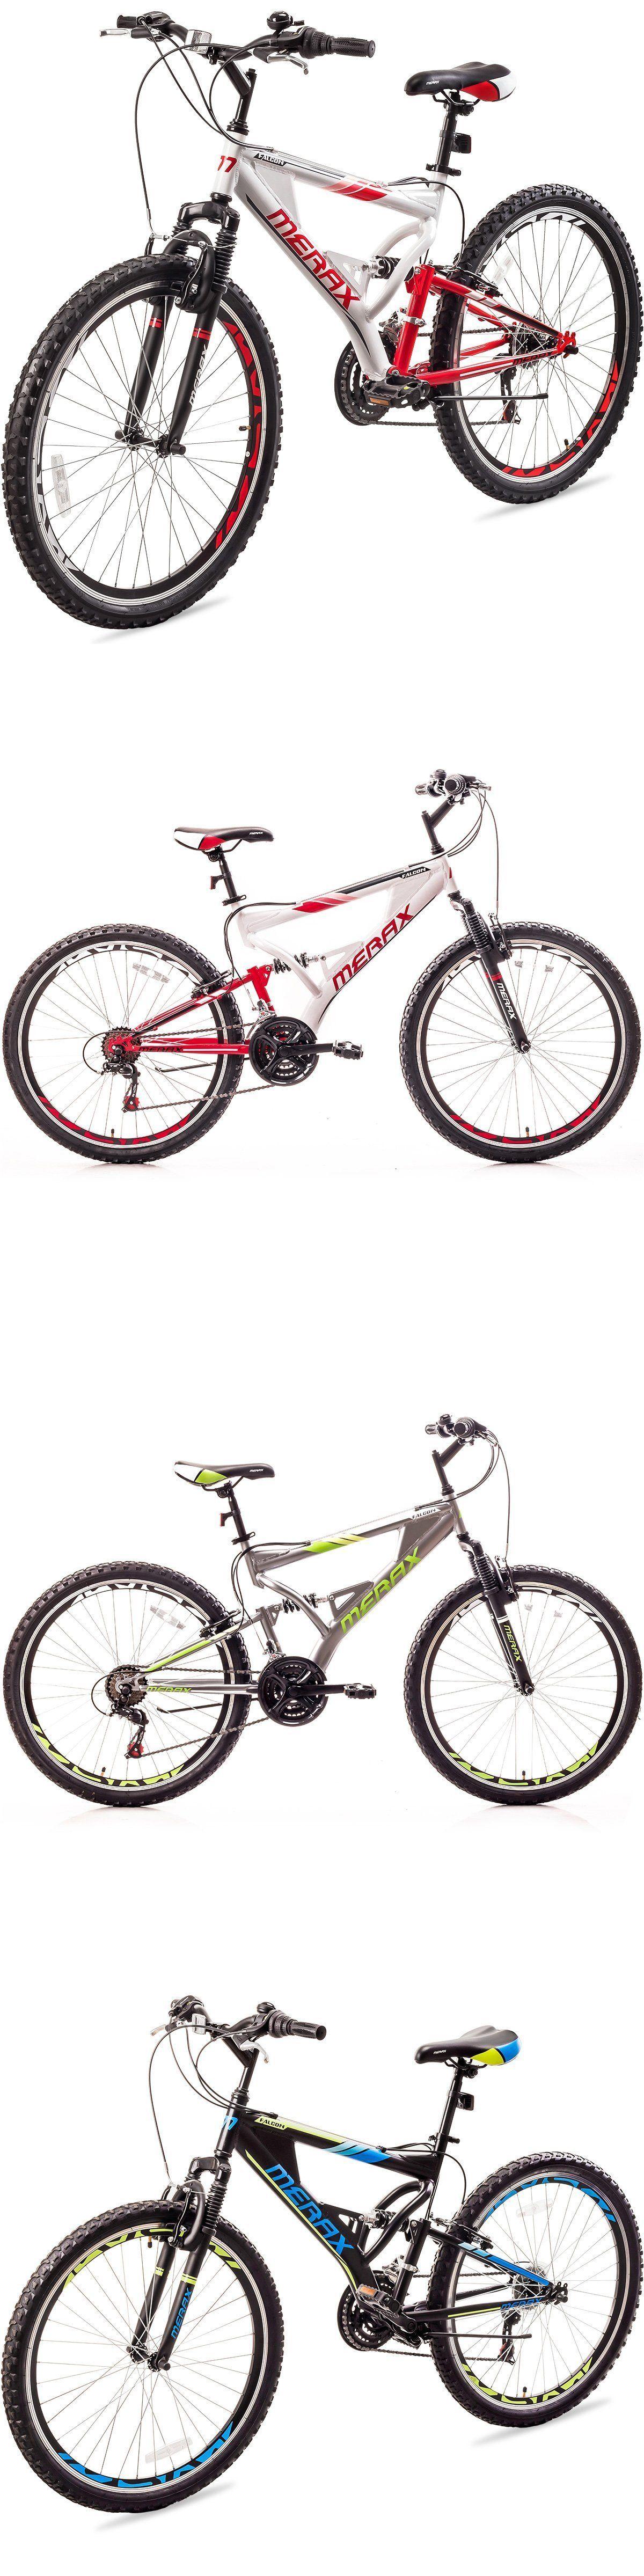 bicycles: Merax Falcon Full Suspension Mountain Bike Aluminum Frame ...